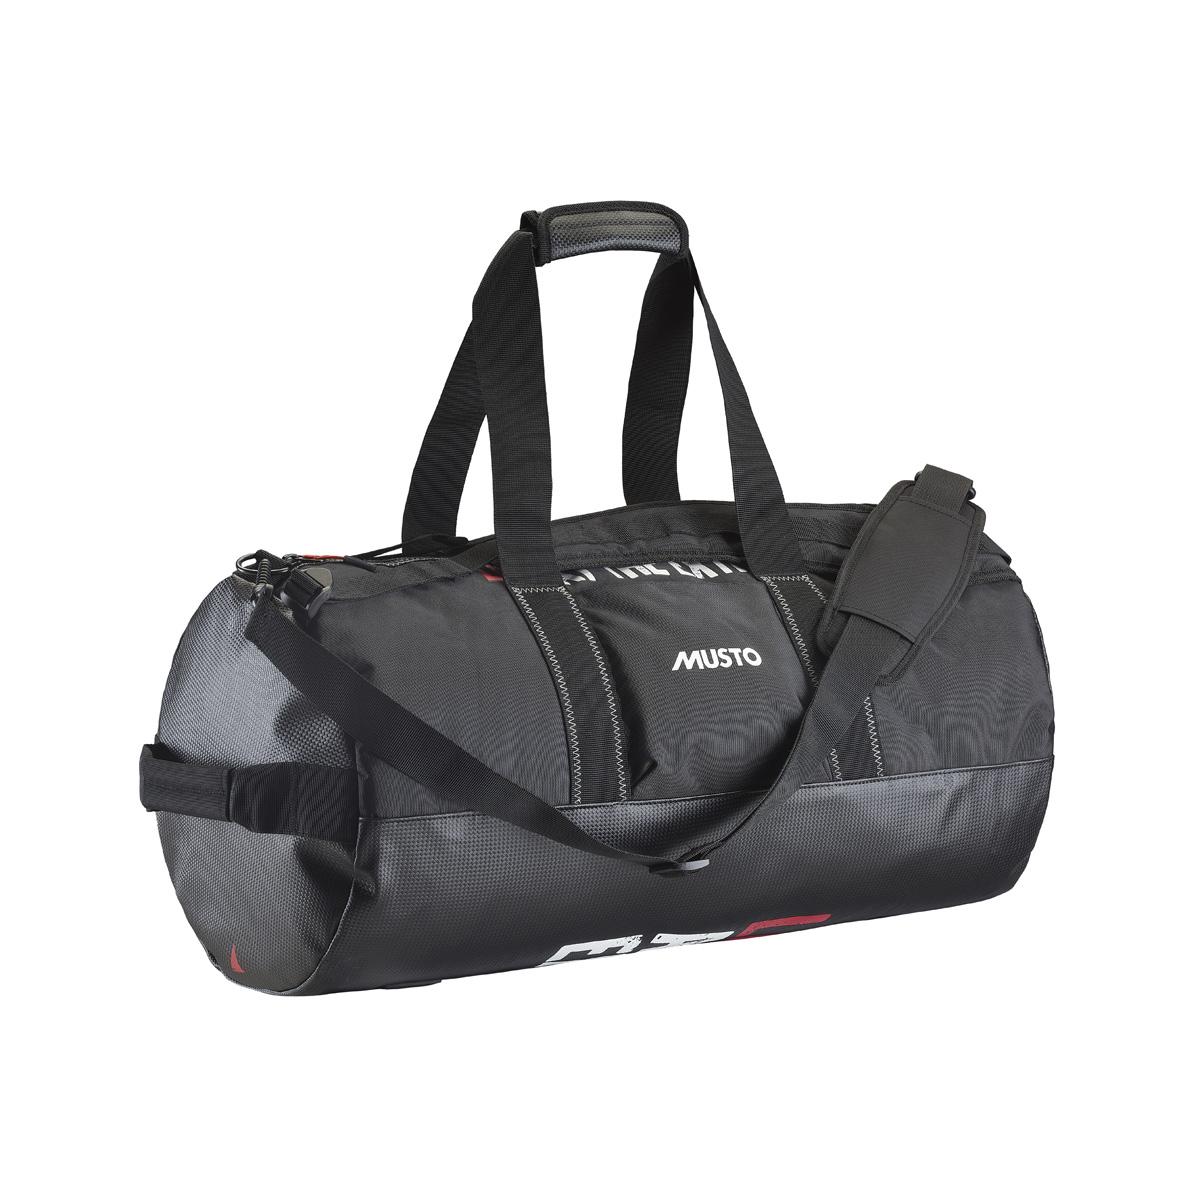 MUSTO VOLVO XL CREW BAG 60L (V17AE0410)